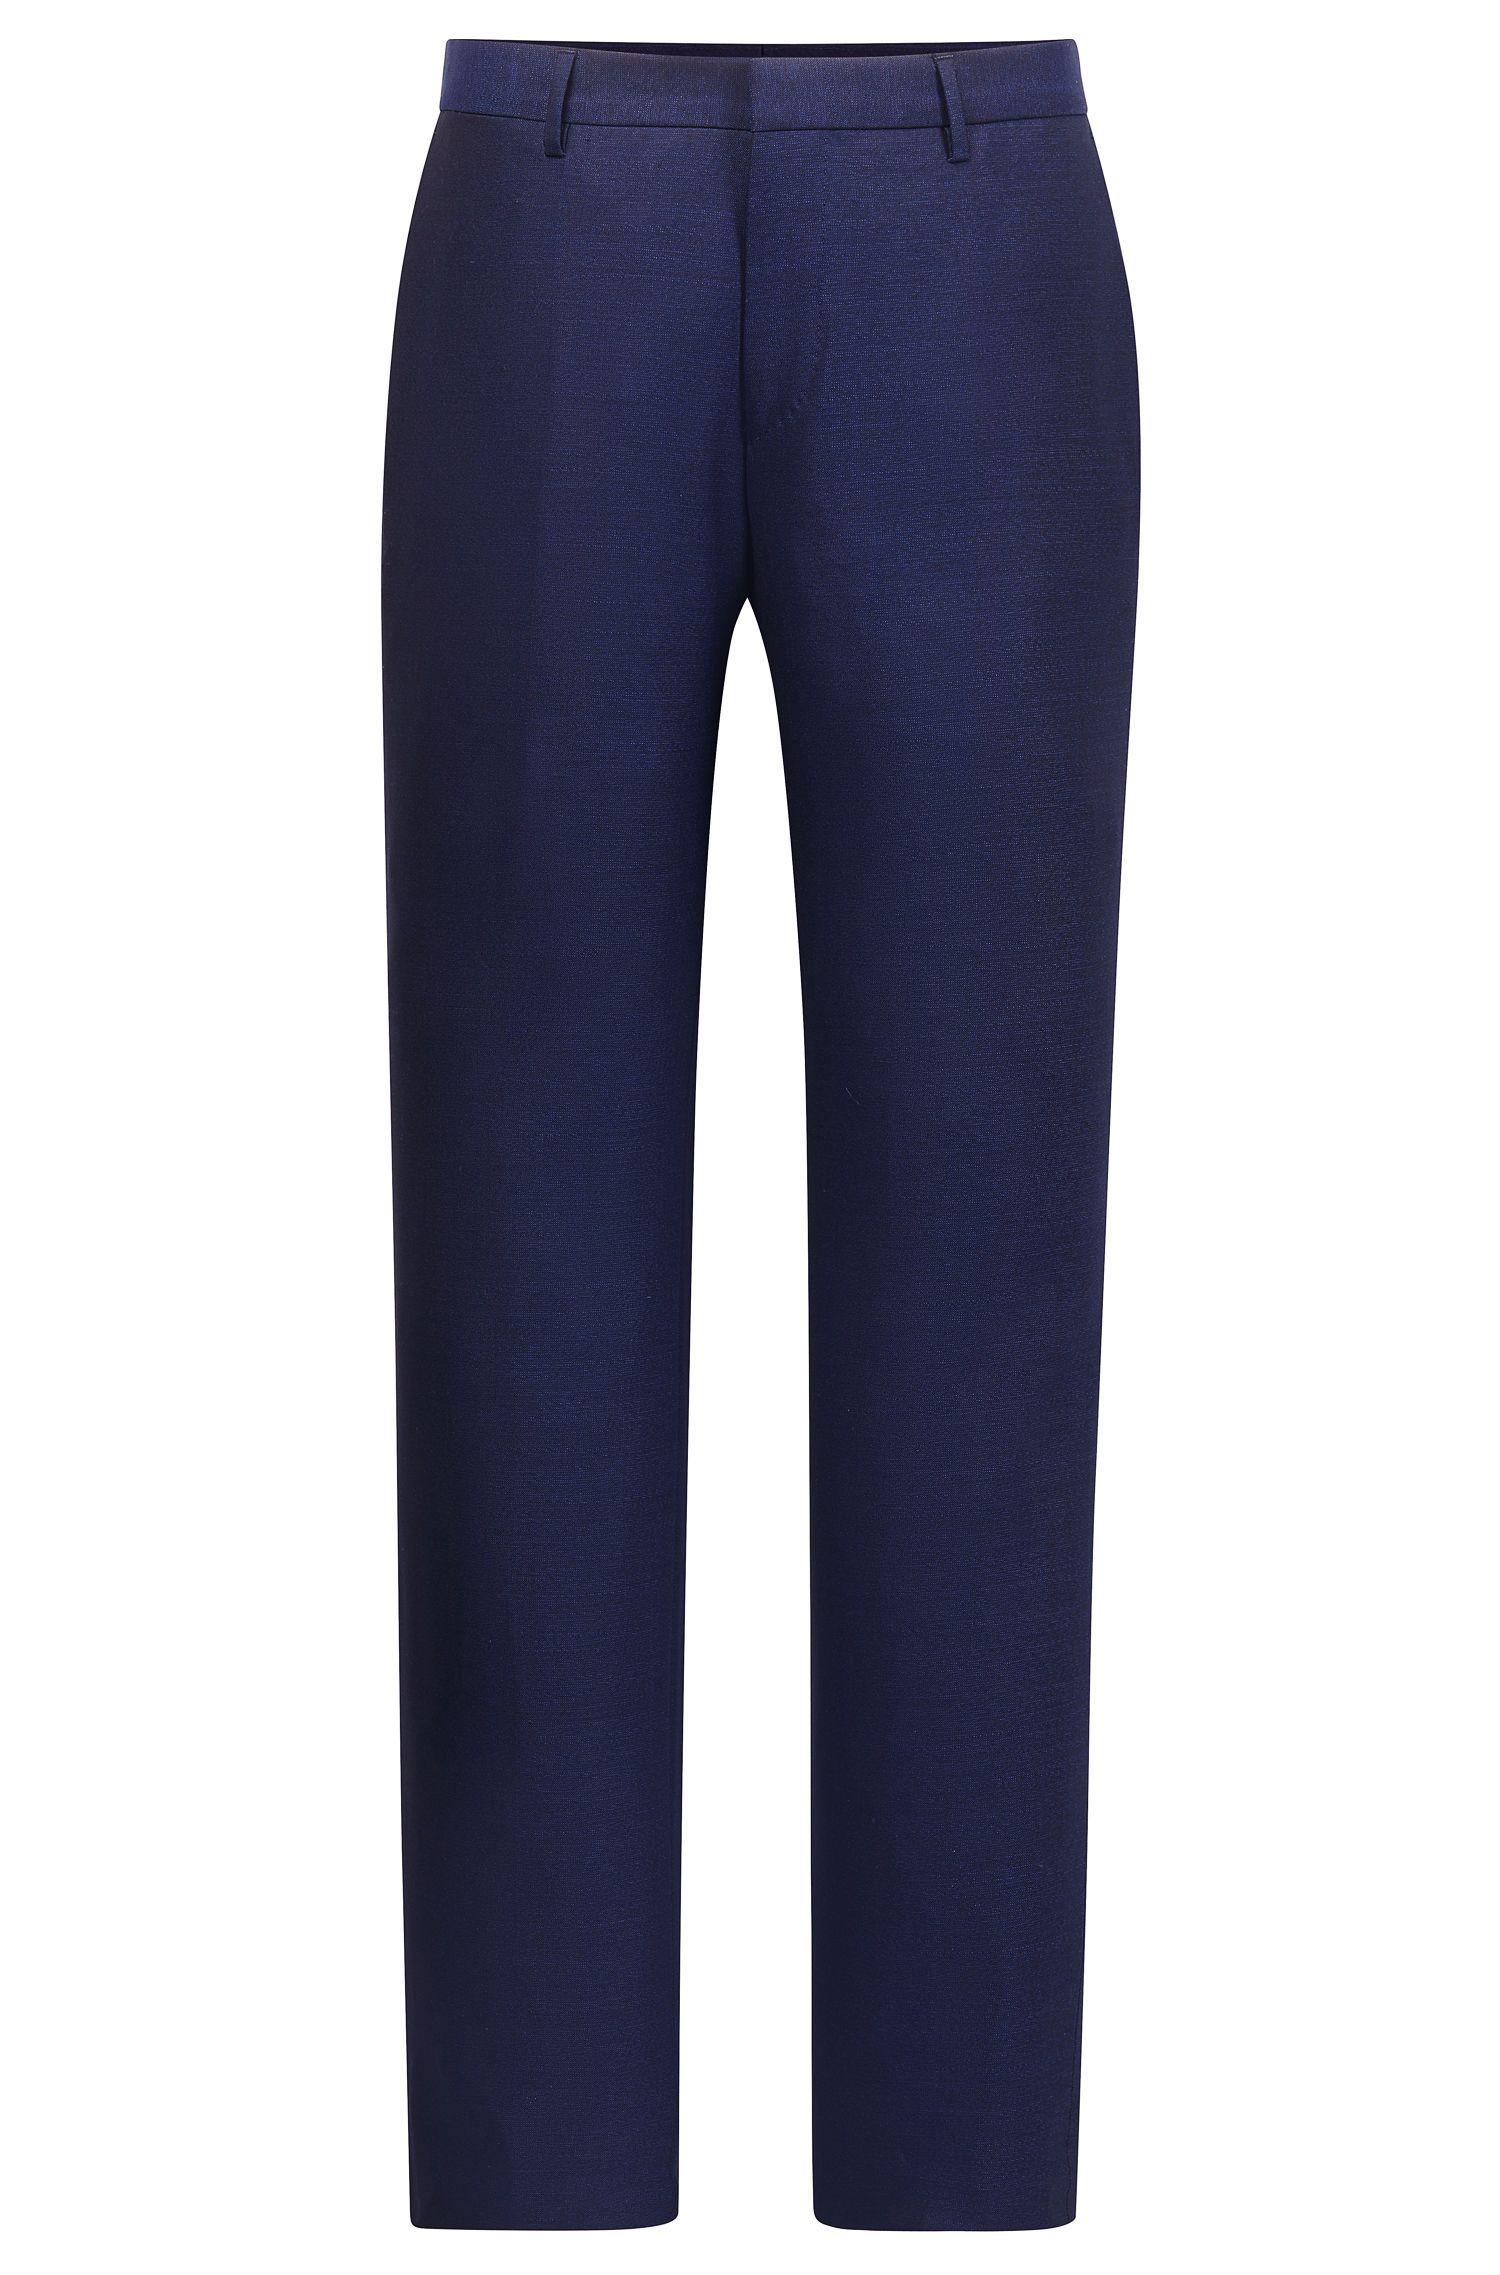 'T-Gleeve' | Slim Fit, Italian Virgin Wool Dress Pants